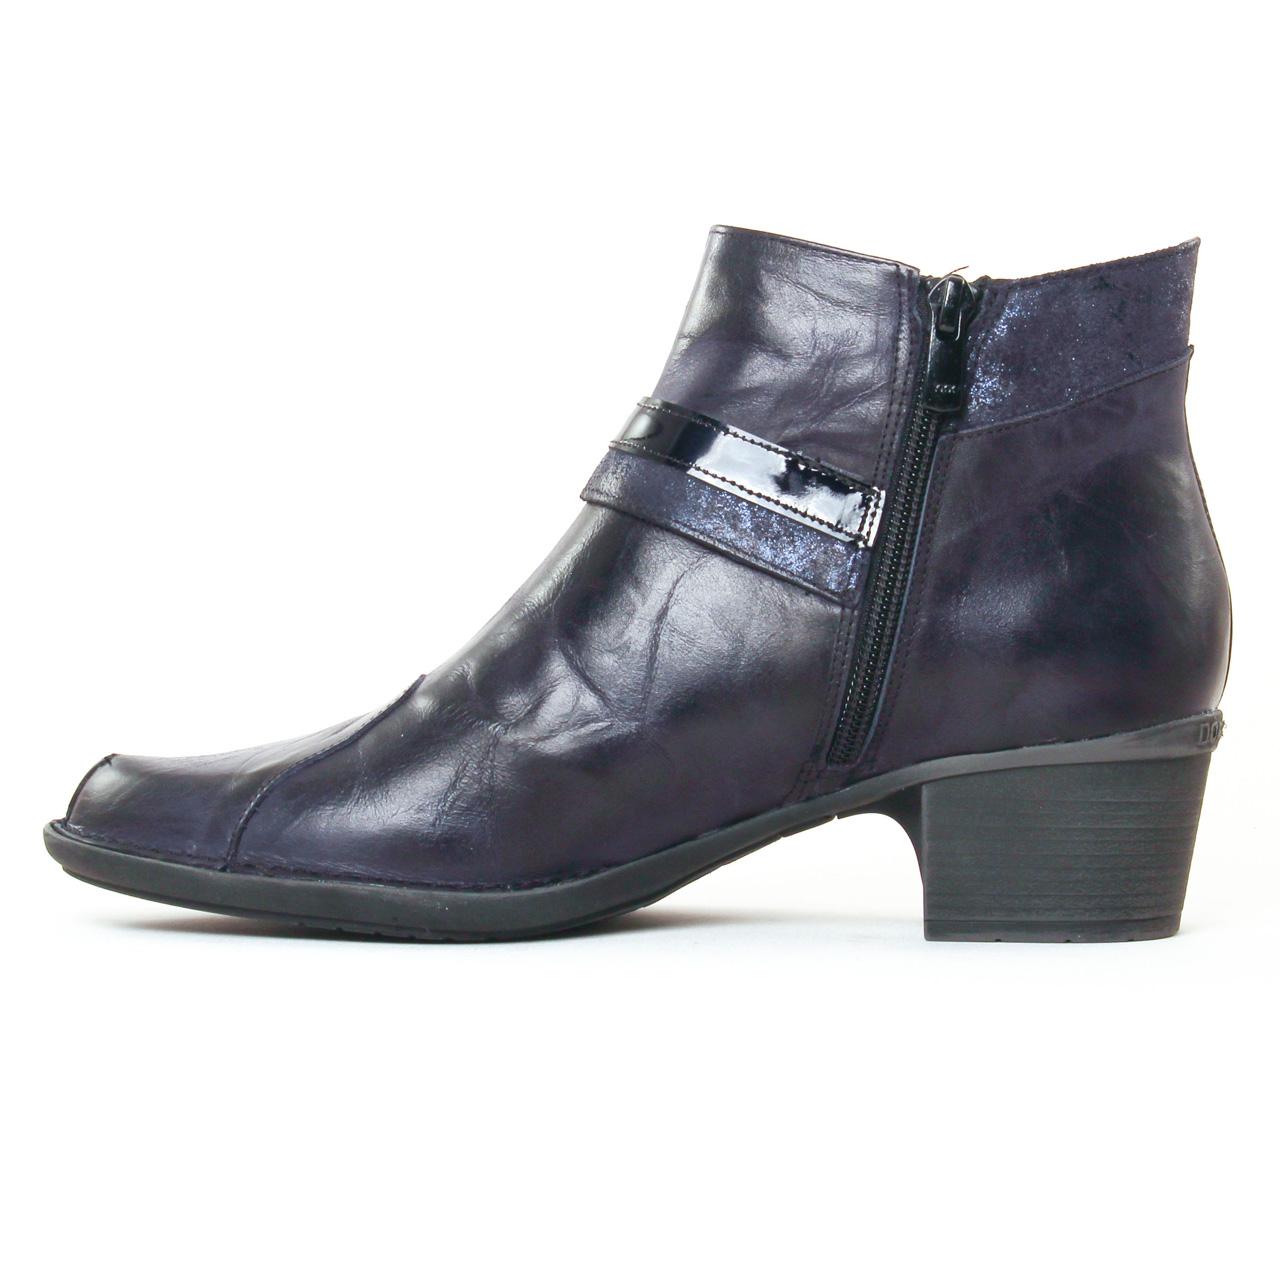 dorking dalma 7370 river boots bleu marine automne hiver. Black Bedroom Furniture Sets. Home Design Ideas